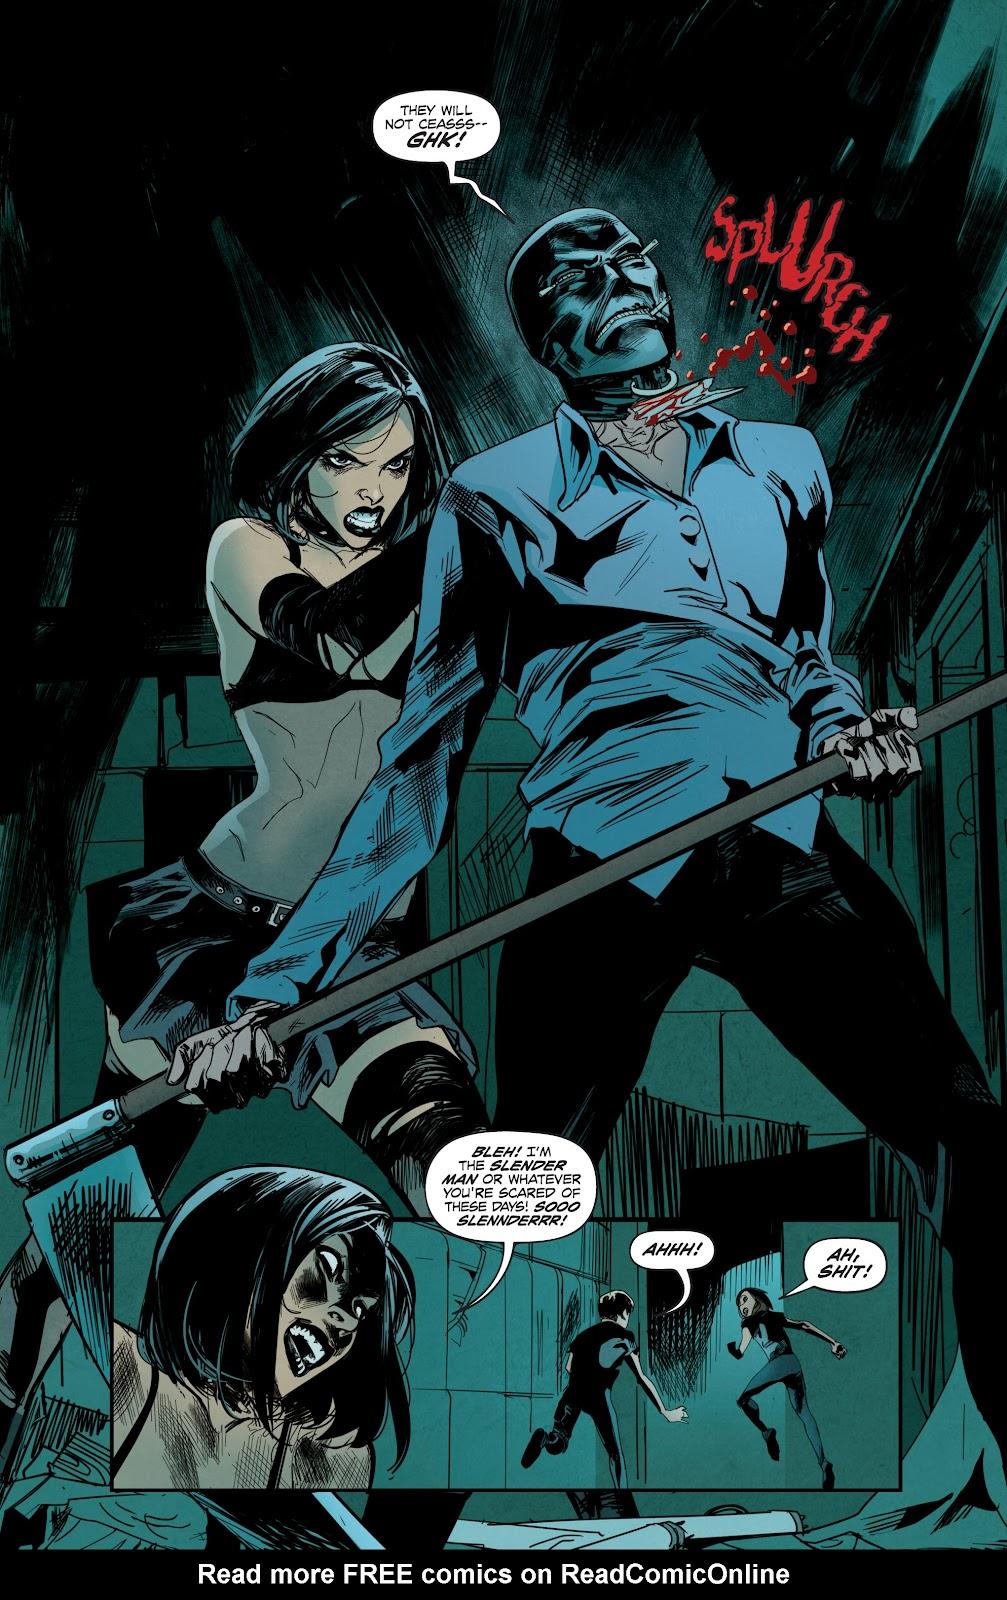 Read online Hack/Slash vs. Chaos comic -  Issue #3 - 6